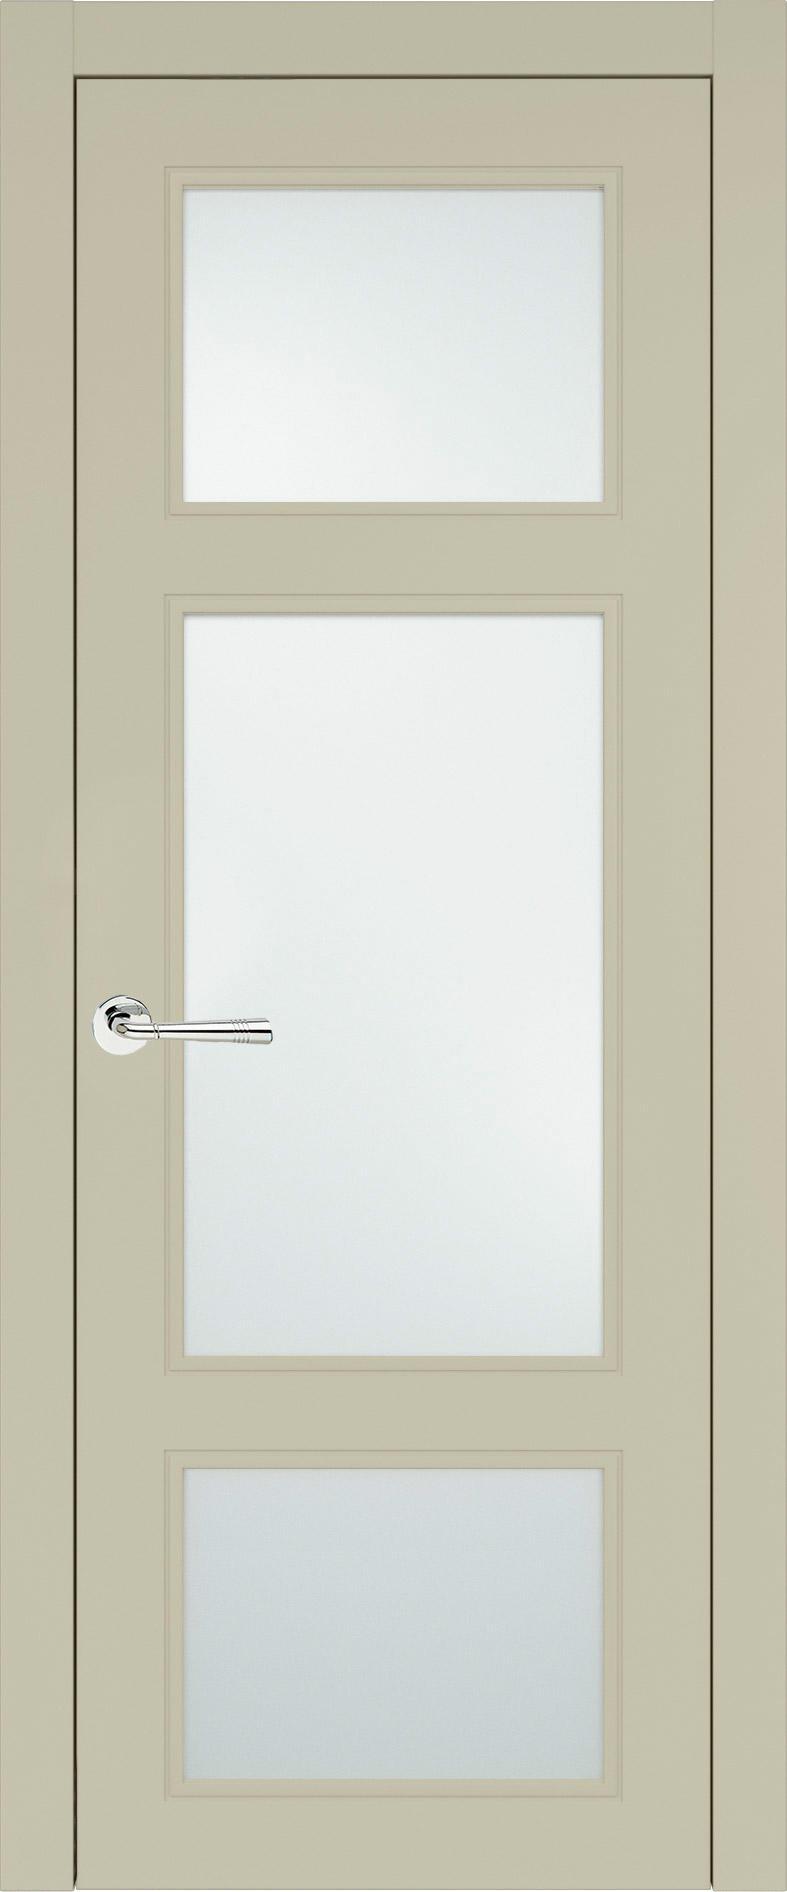 Siena Neo Classic цвет - Серо-оливковая эмаль (RAL 7032) Со стеклом (ДО)